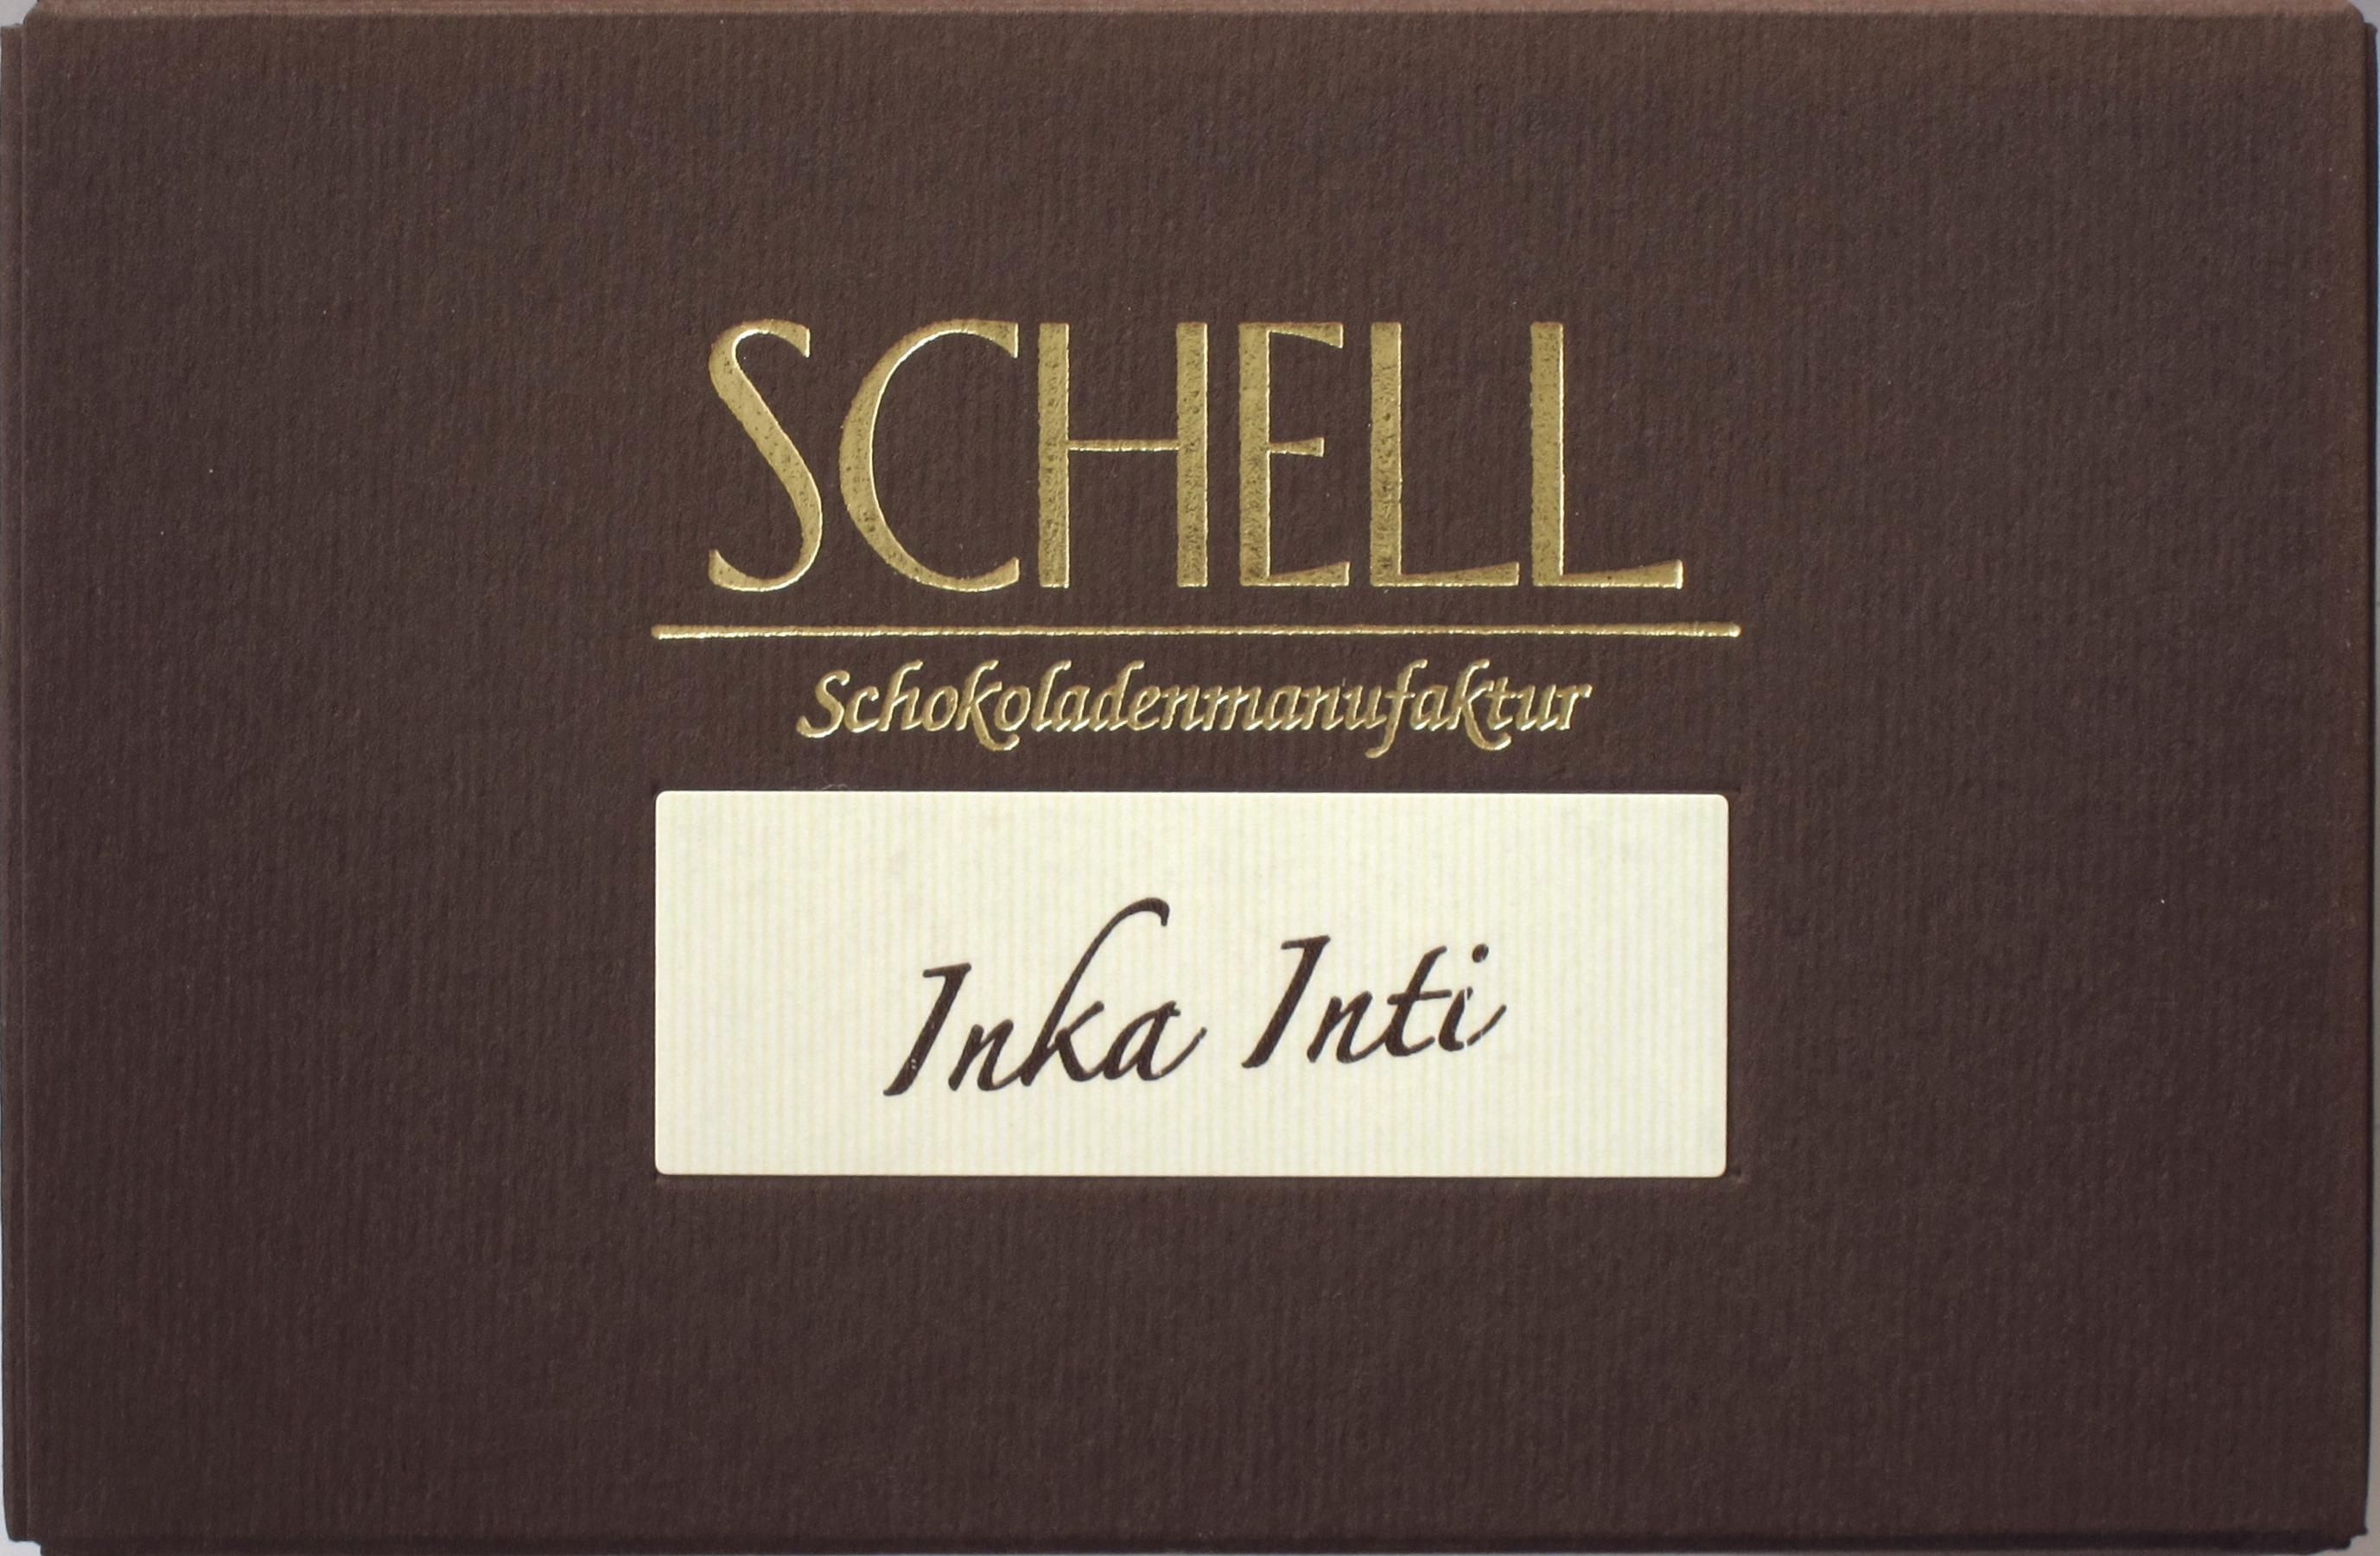 "Schell ""Inka Inti"" Bitterschokolade"